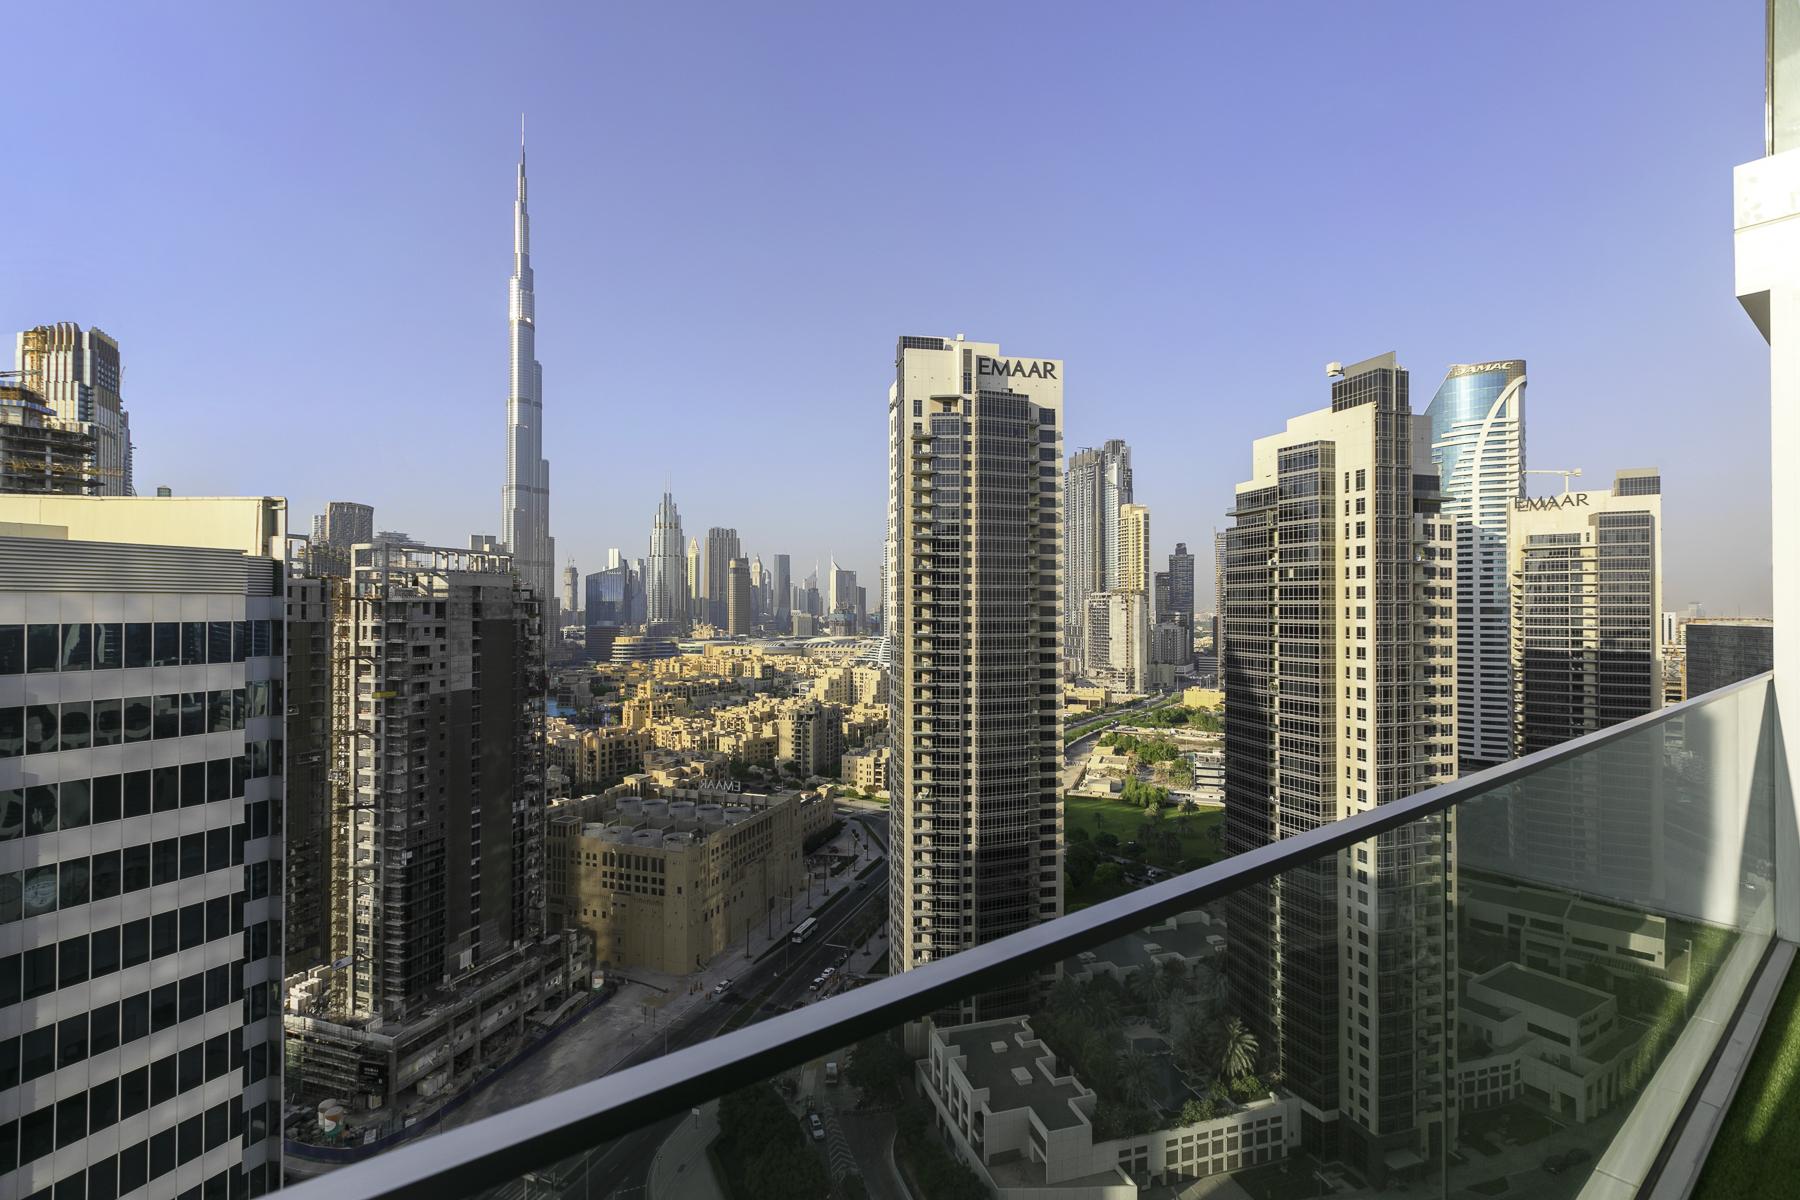 Brand New Comfy Burj Khalifa View Studio in Marquise Square, Business Bay # 2314 photo 16406917